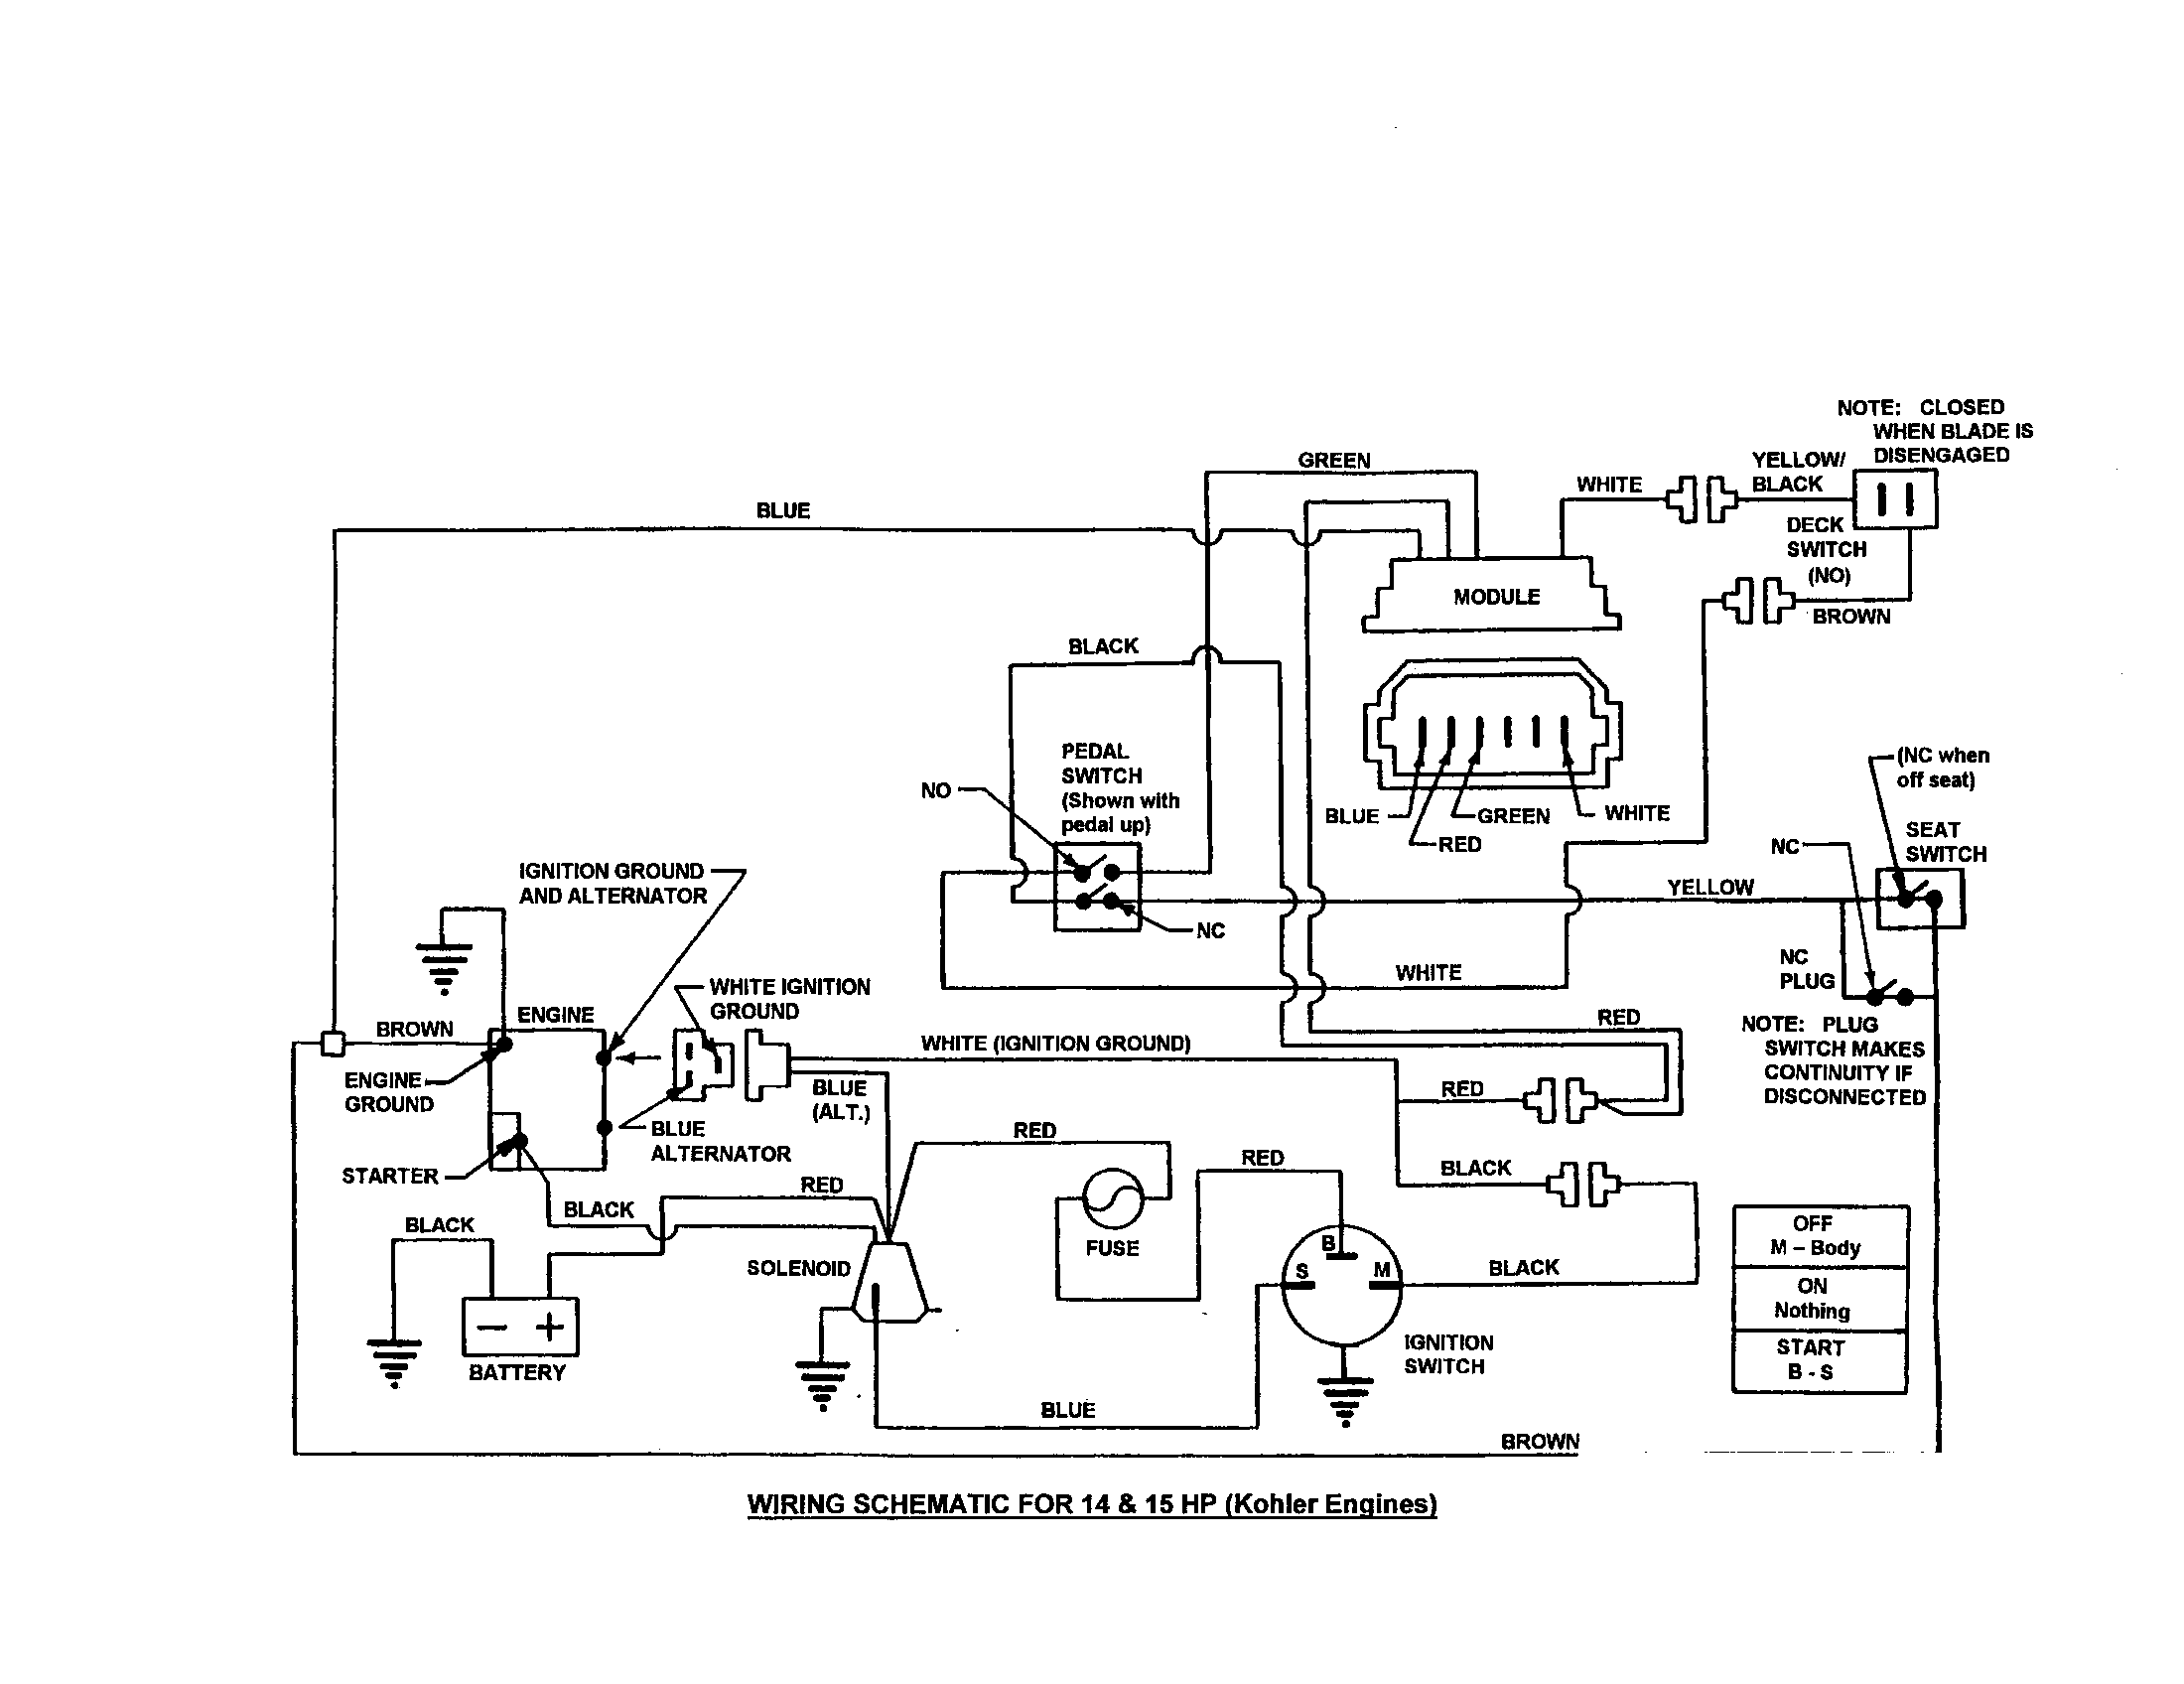 snapper 250816b wiring schematic 14 15 hp kohler diagram [ 2200 x 1696 Pixel ]